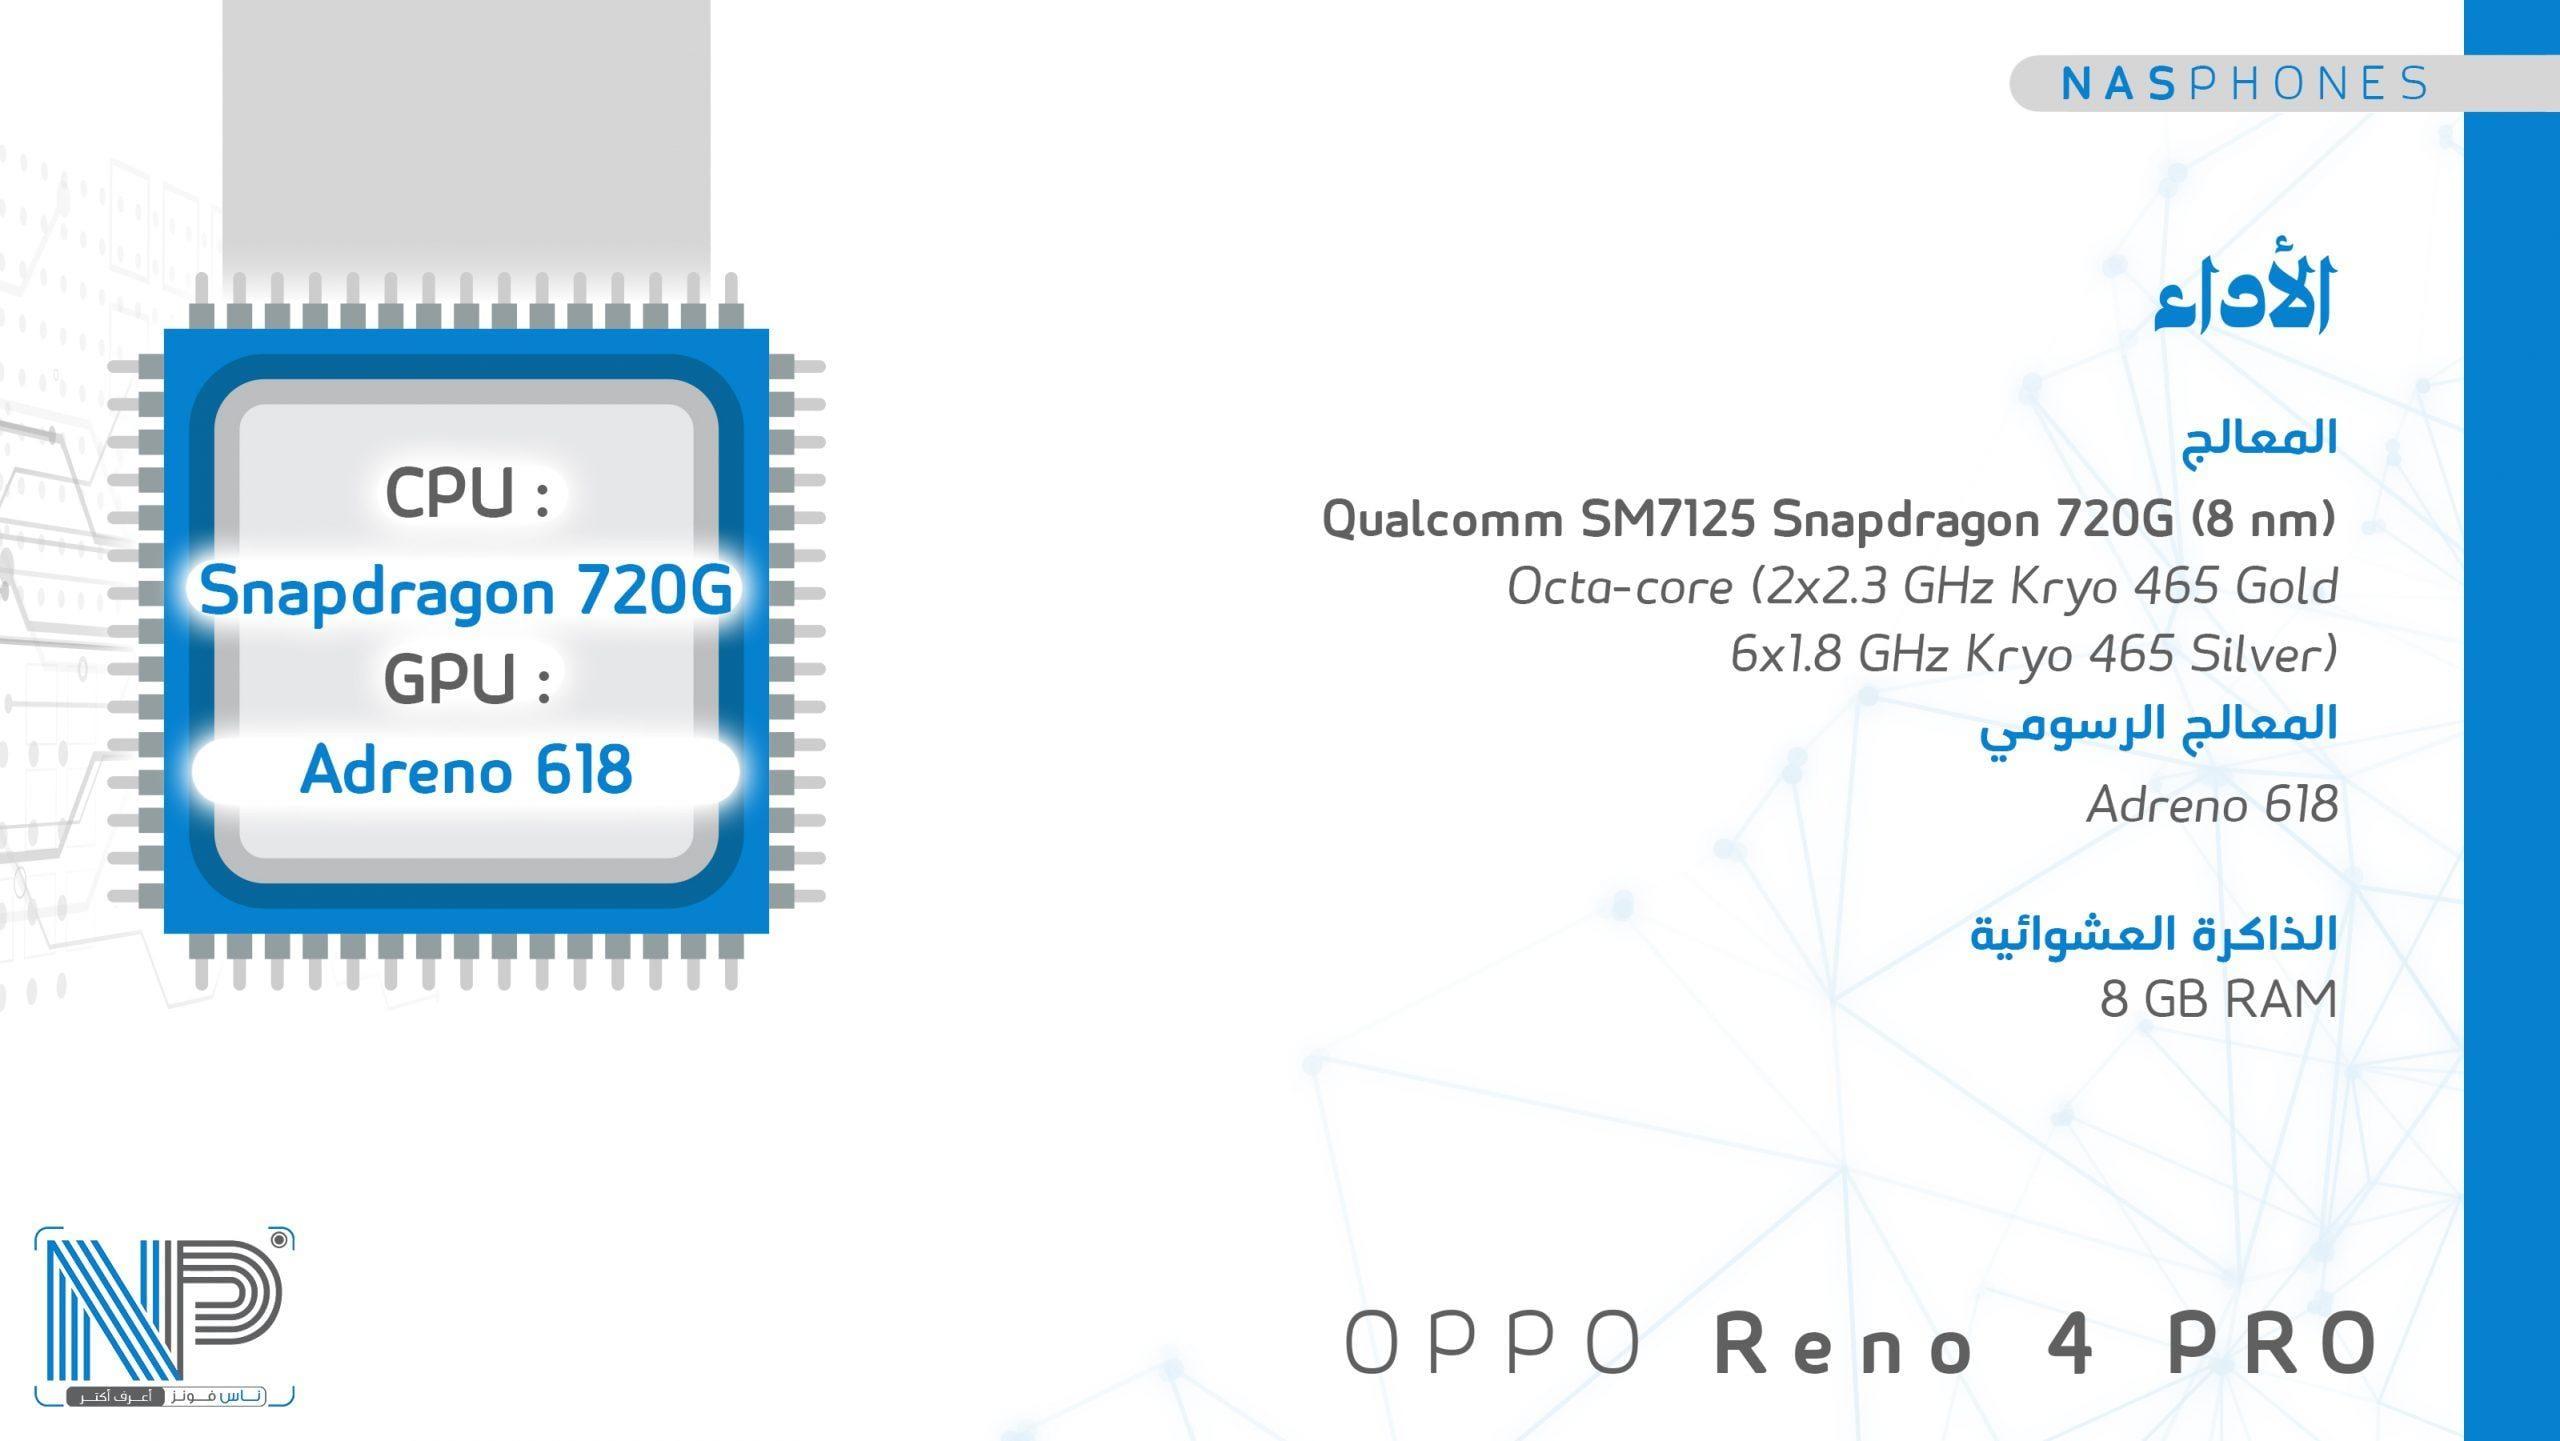 أداء موبايل Oppo reno 4 Pro